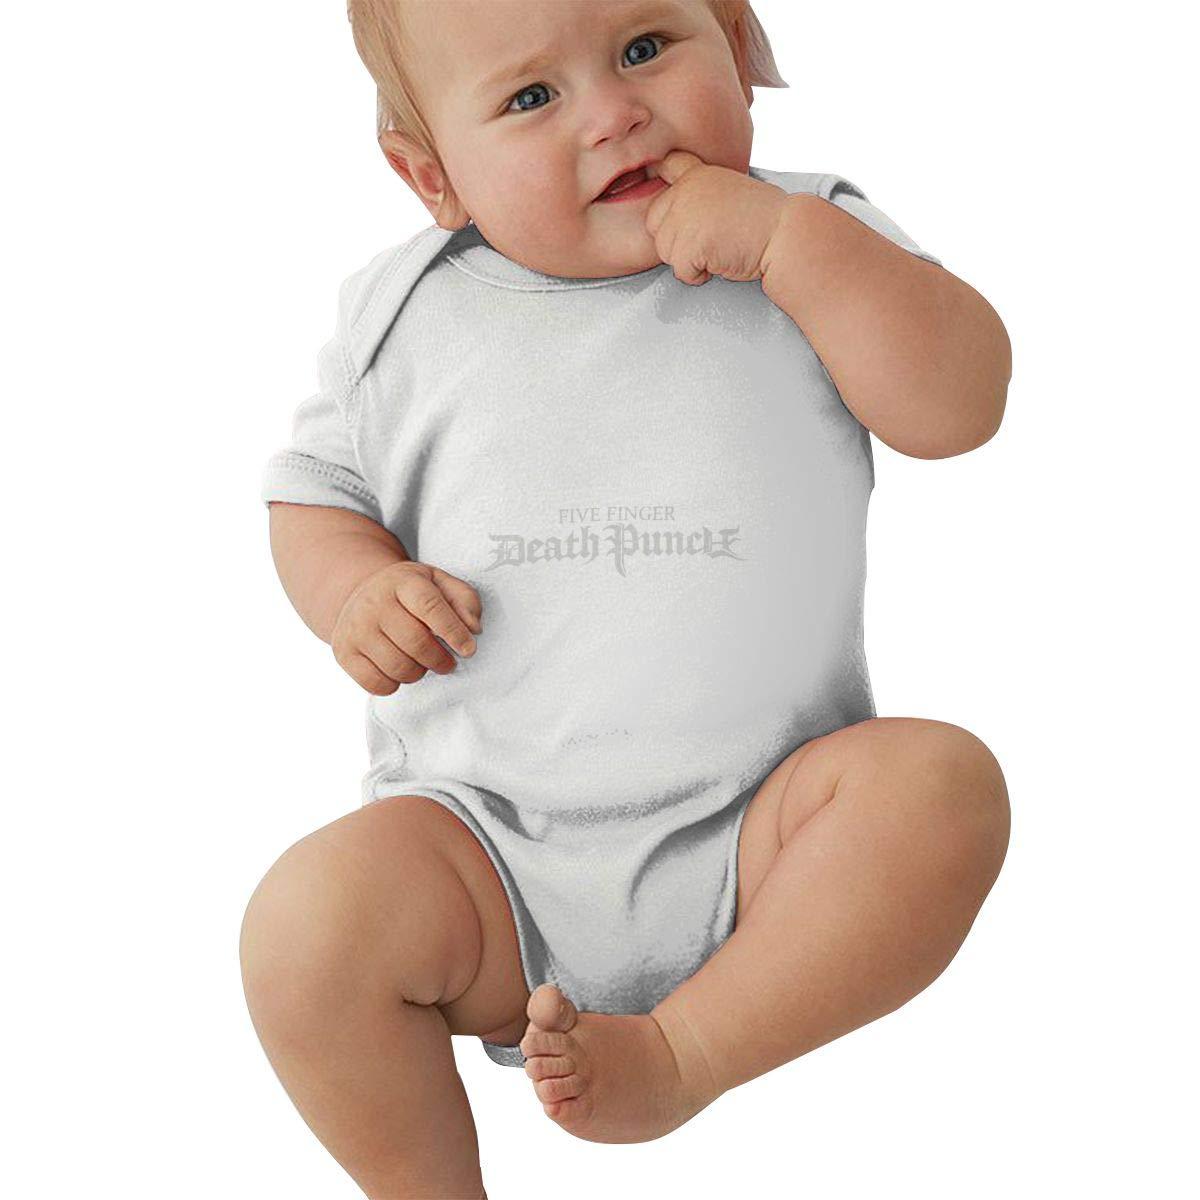 Five Finger Death Punch Unisex Short Sleeve Bodysuit Romper Jumpsuit Outfits for Baby